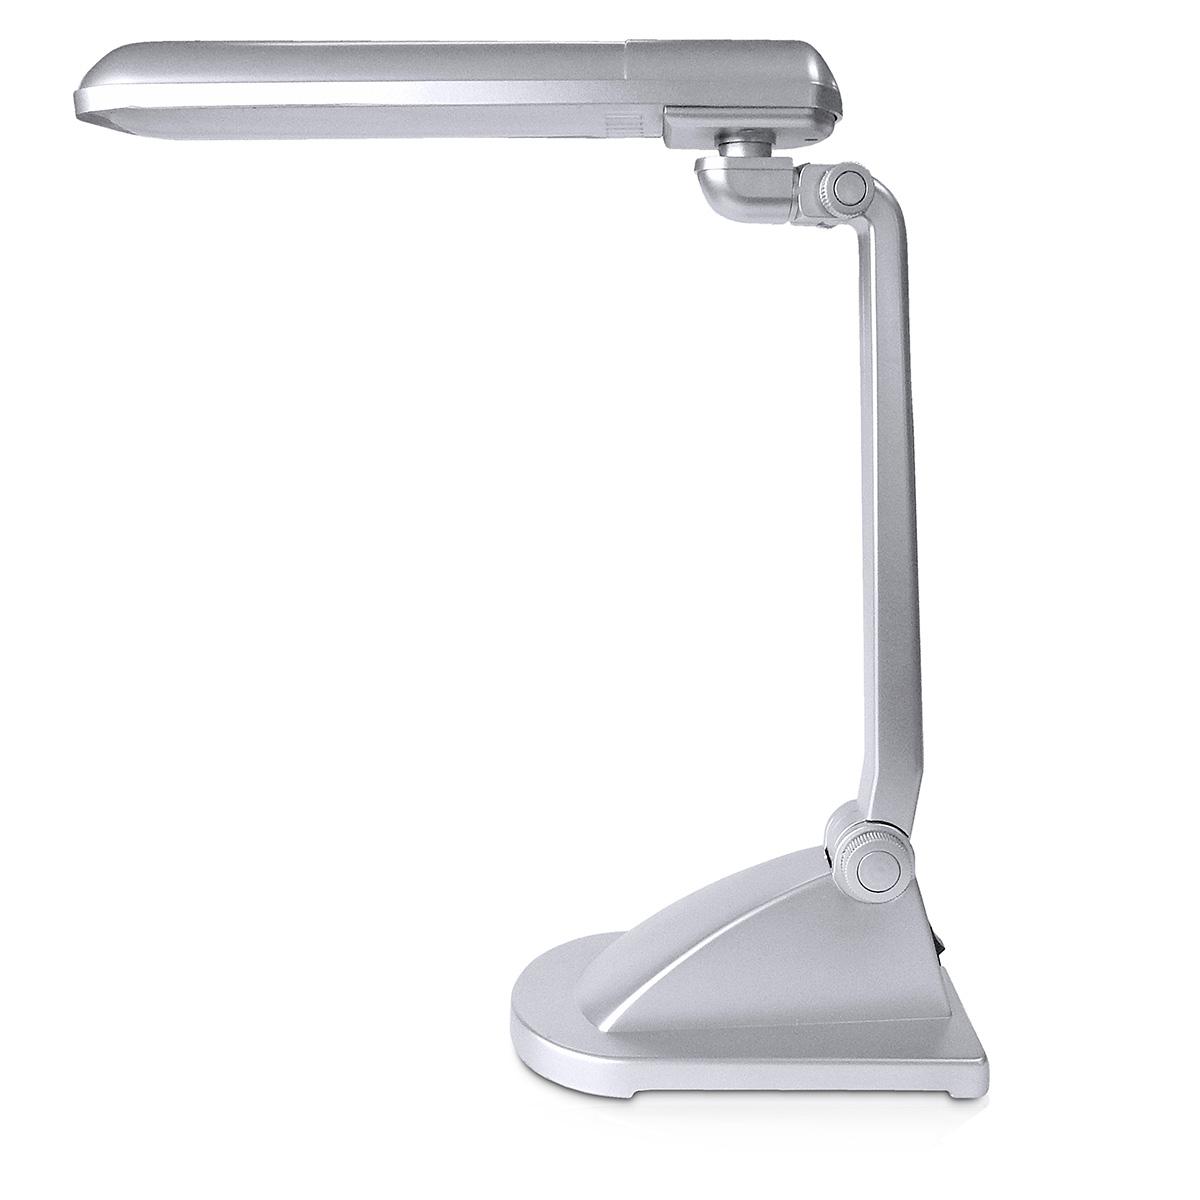 Luminaria De Mesa Premium Polietileno 1x11w 127v Cinza